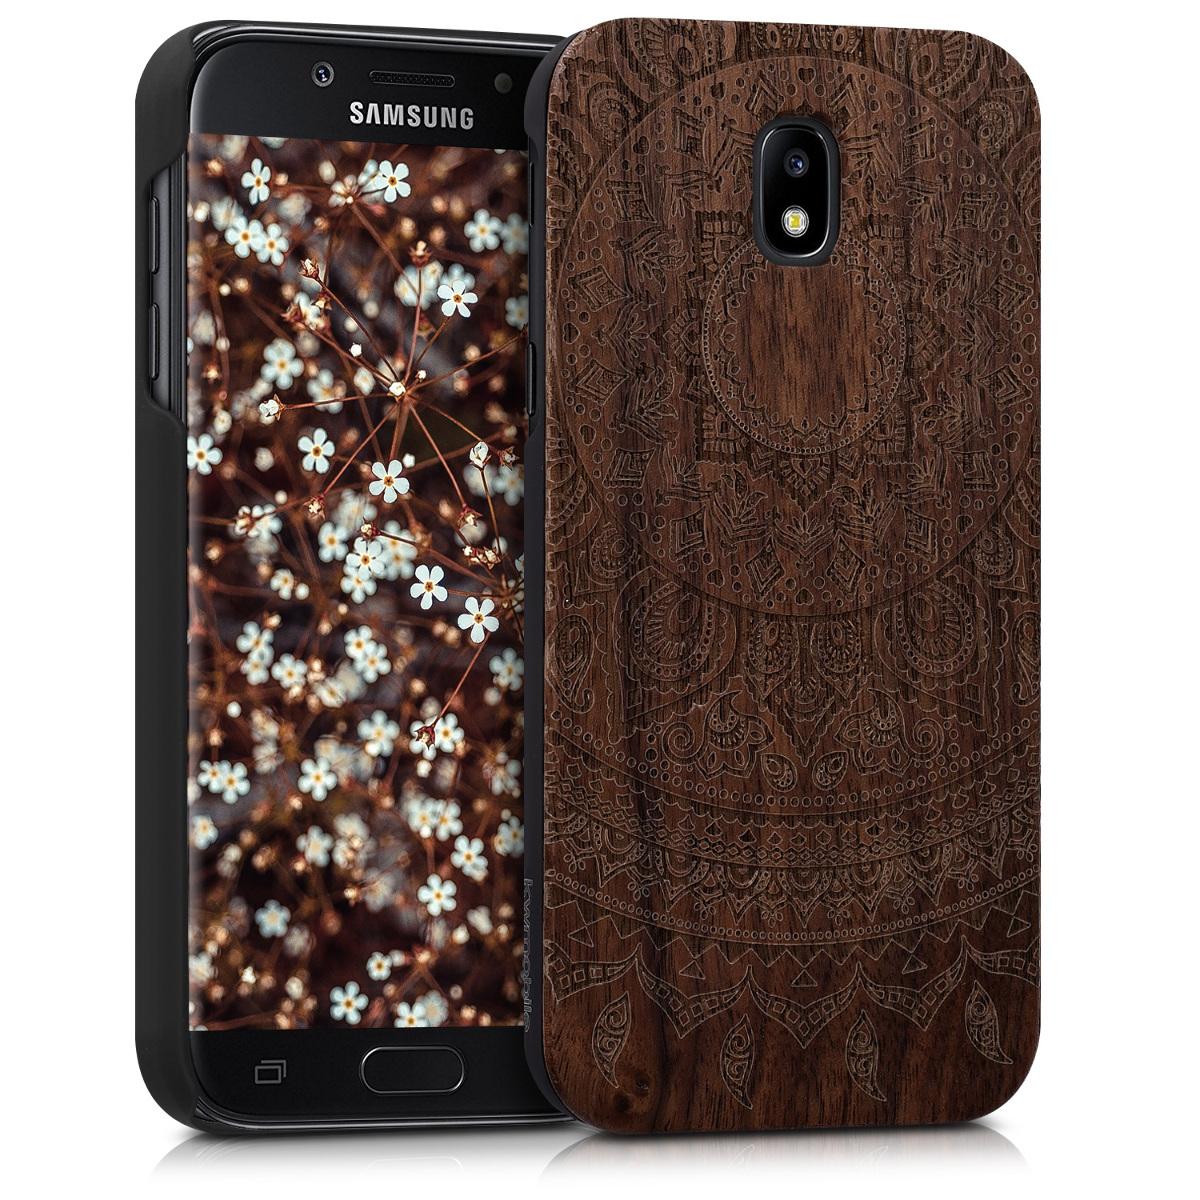 KW Ξύλινη Θήκη Samsung Galaxy J5 (2017) DUOS - Dark Brown (41157.01)